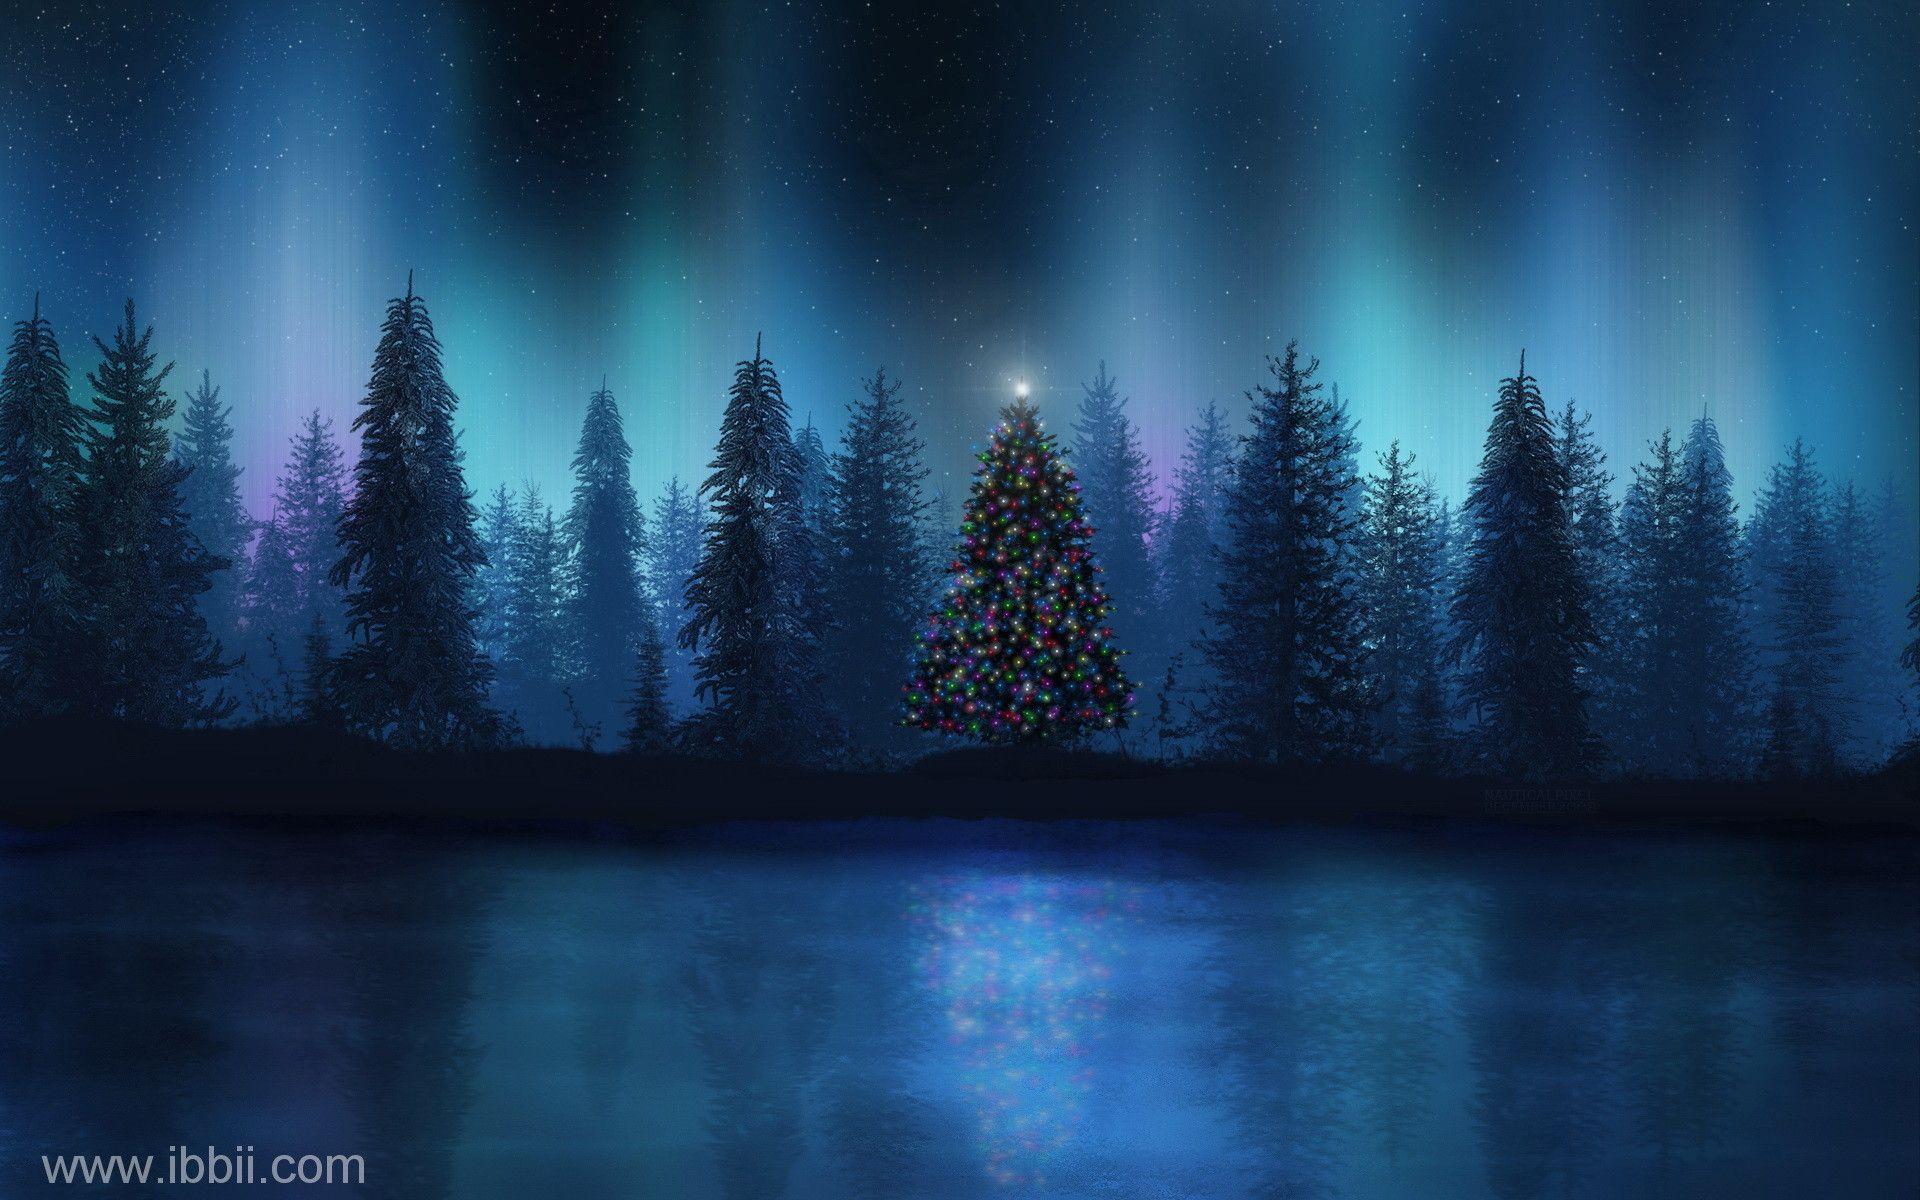 Night Snow Scenes Wallpapers Wallpaper Cave